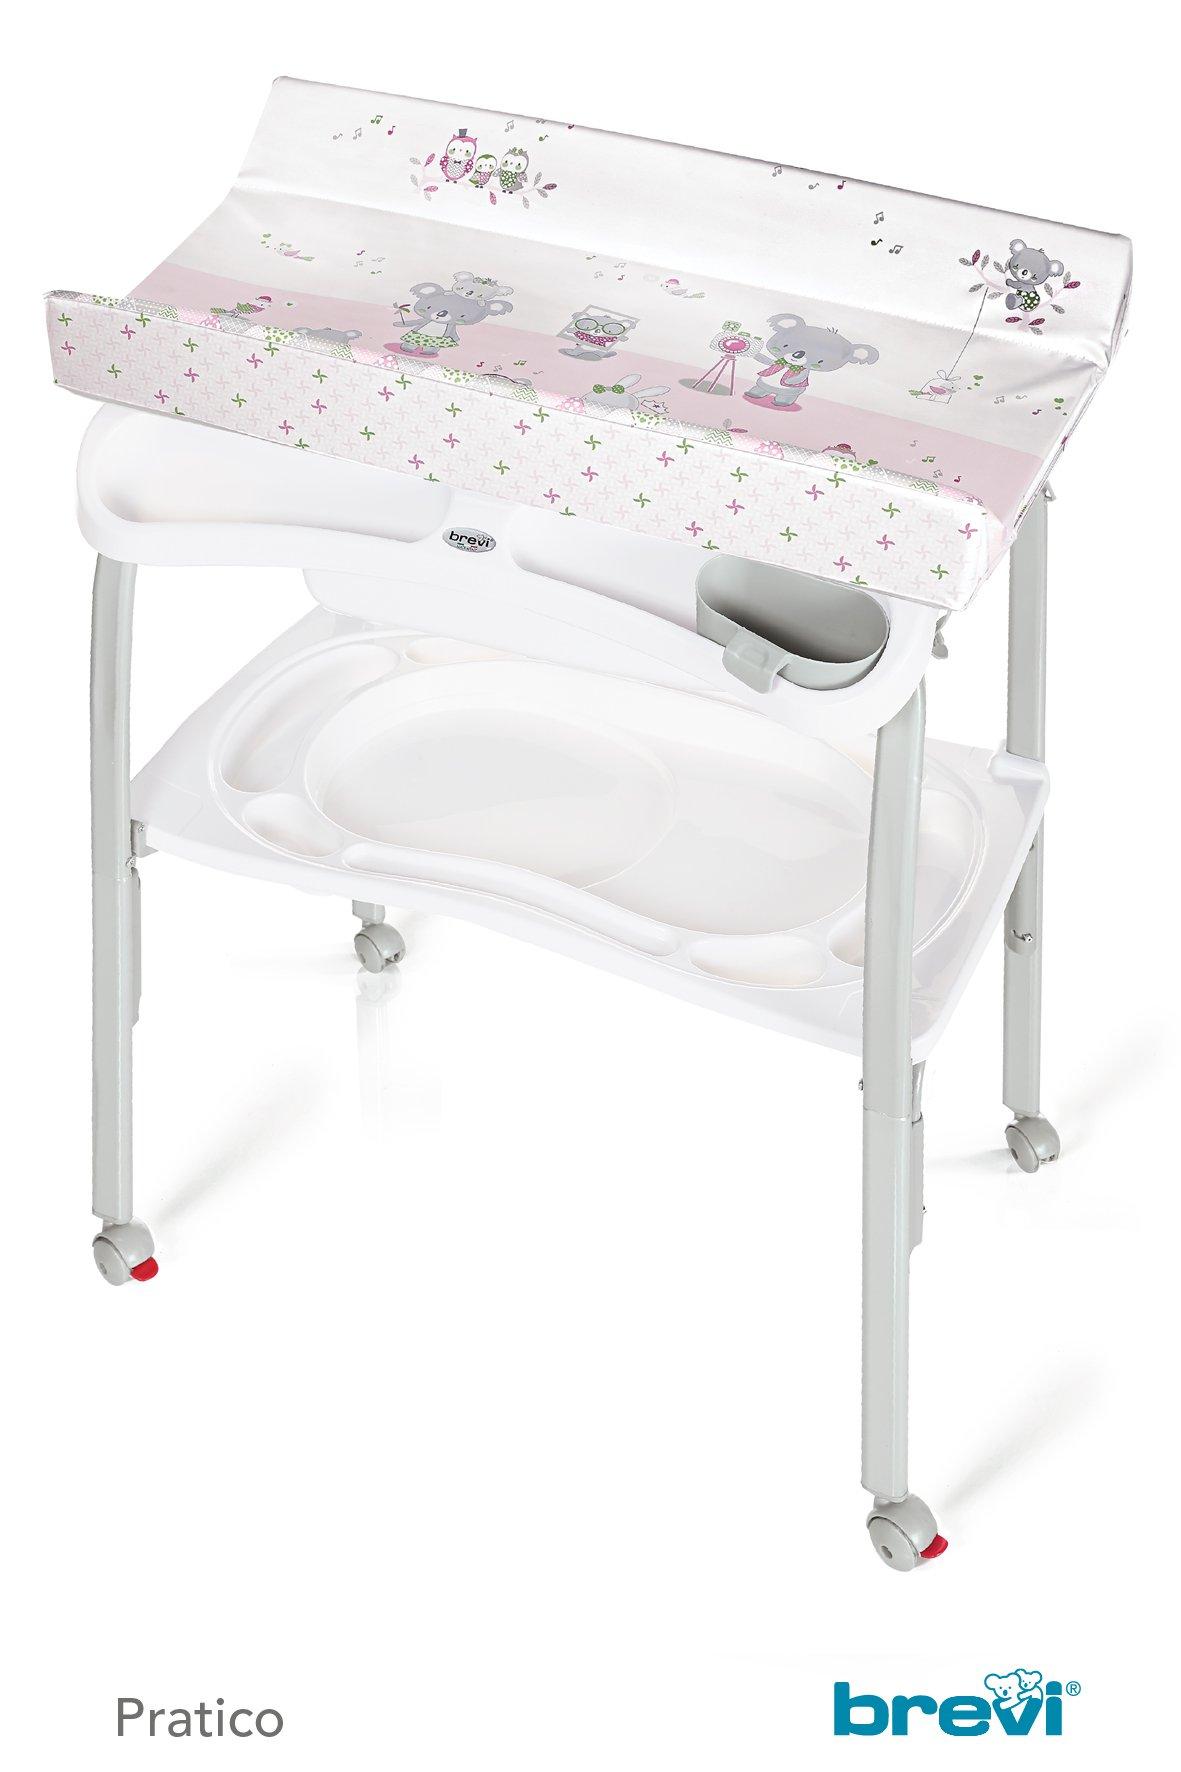 brevi bade und wickelkombination pratico 2018 pink buy. Black Bedroom Furniture Sets. Home Design Ideas